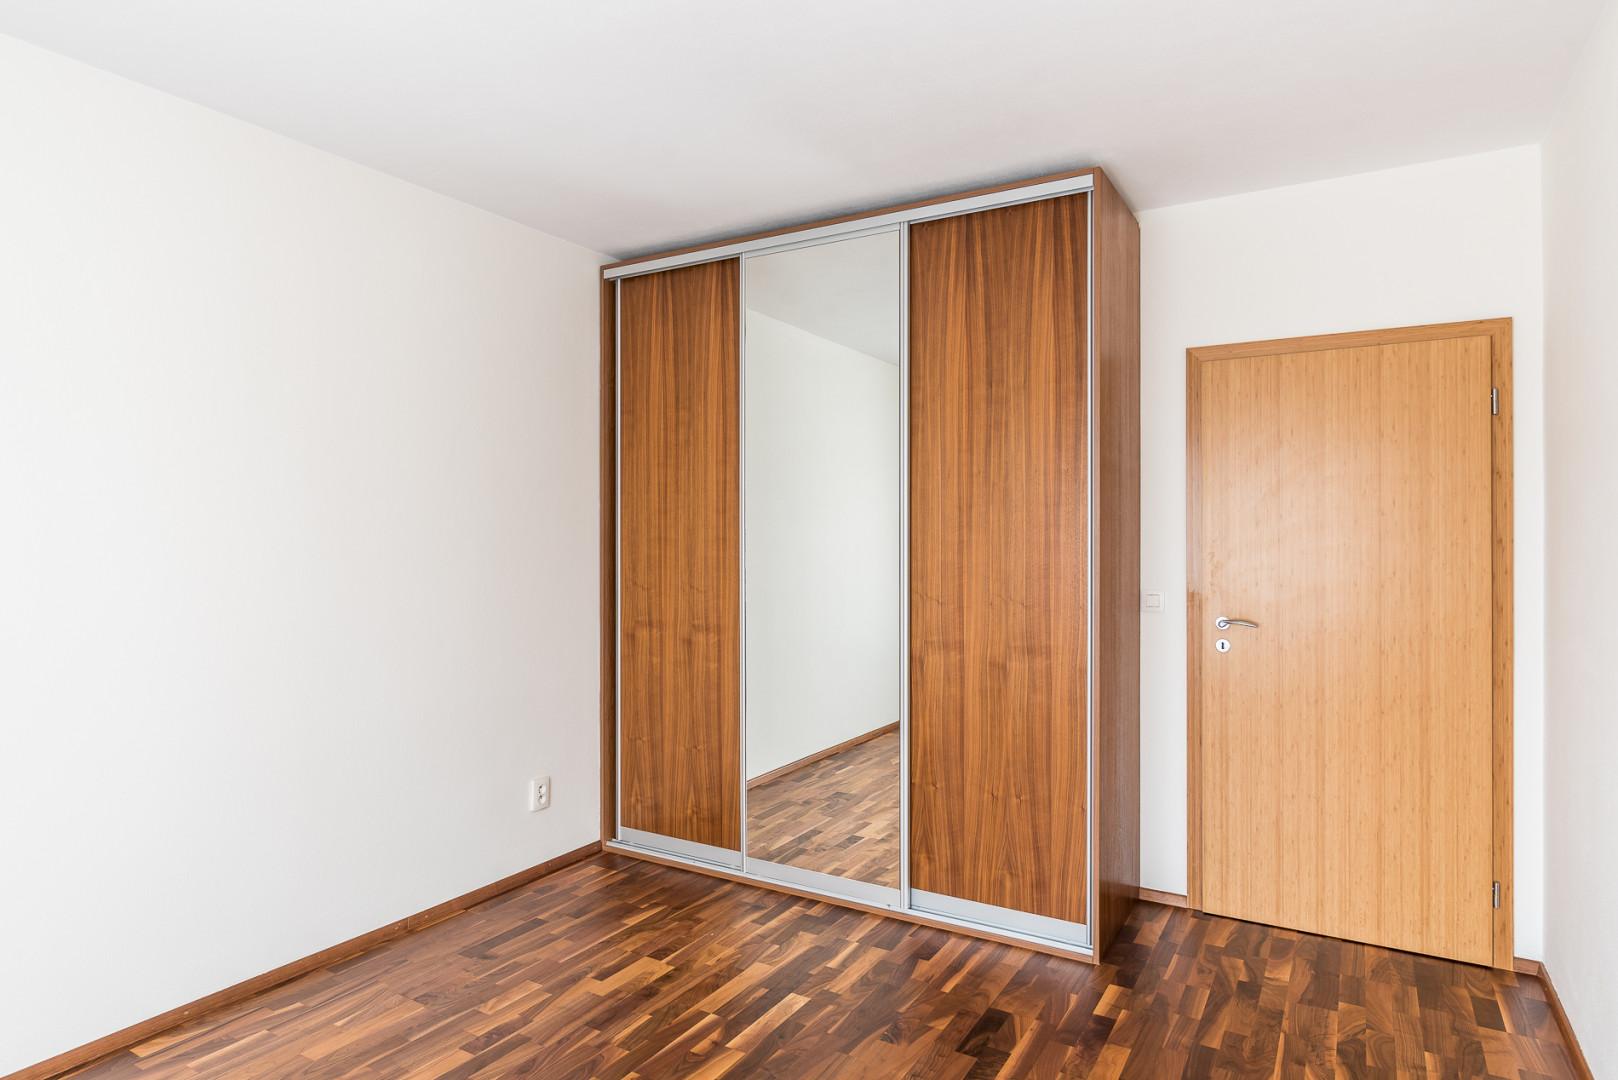 Byt, 2 - izbový, 53.10m2, Novostavba Silvánium Pezinok